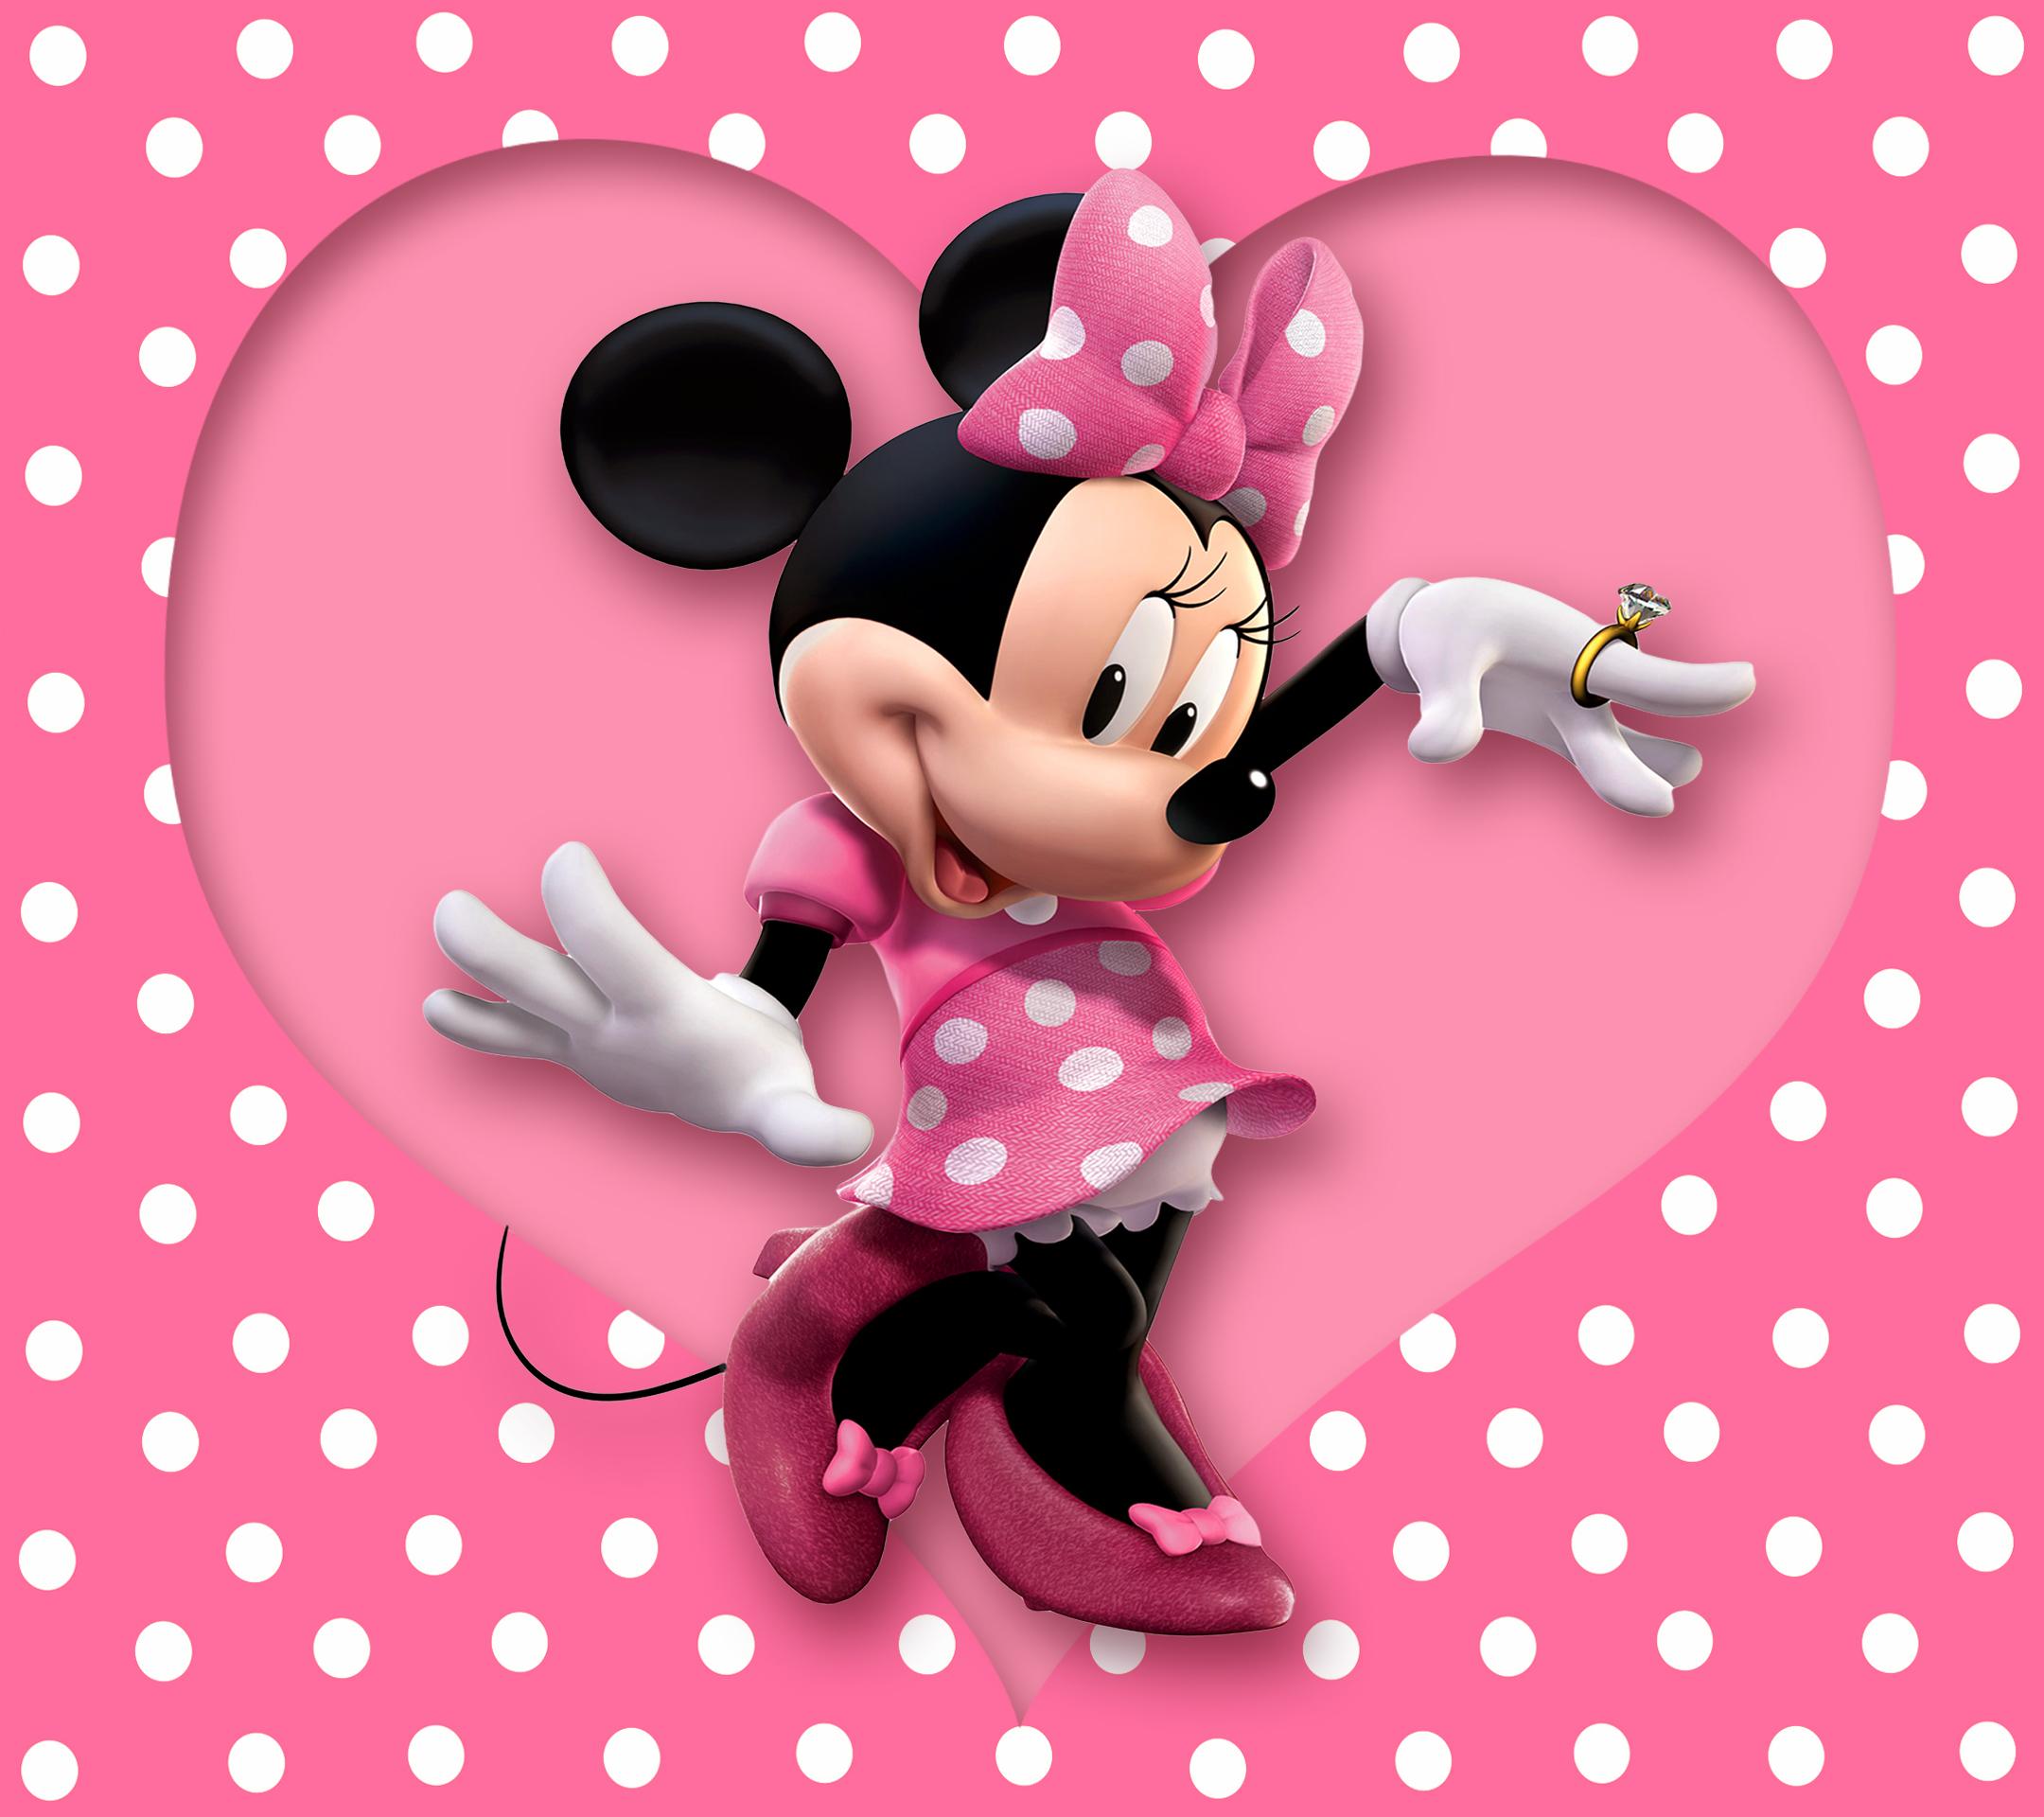 Imágenes de Minnie Mouse de Disney Gratis